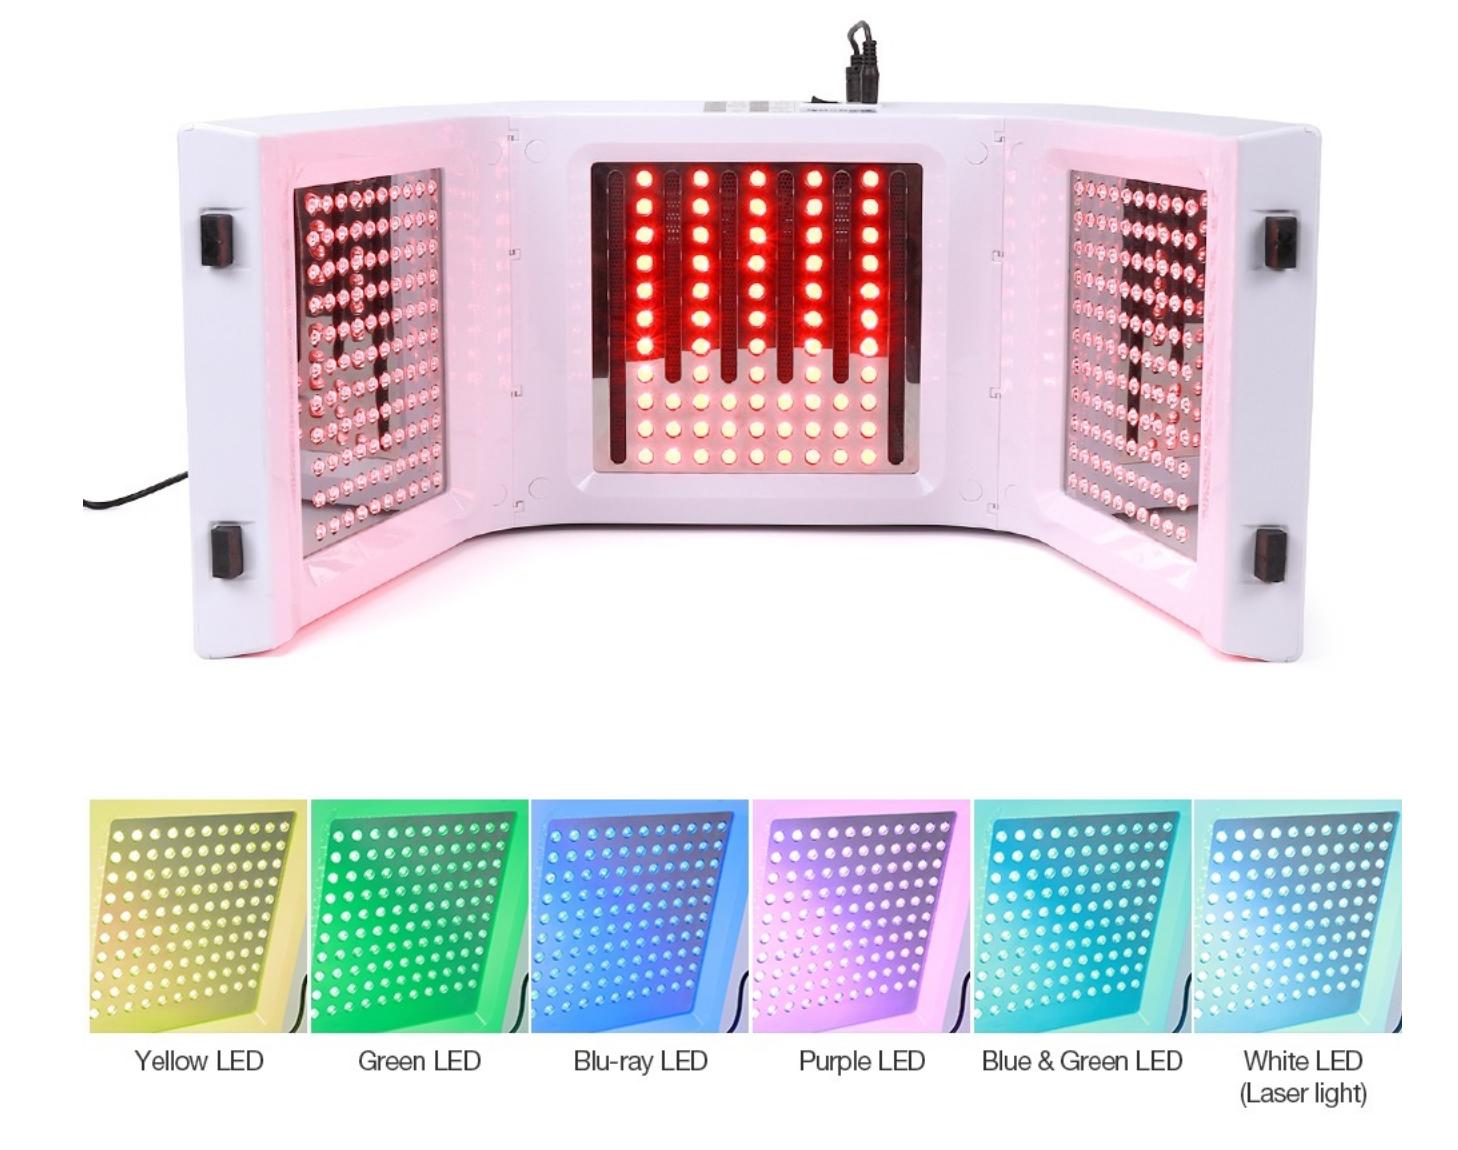 apparat-lys-terapi-7-forskellige-lys-farver